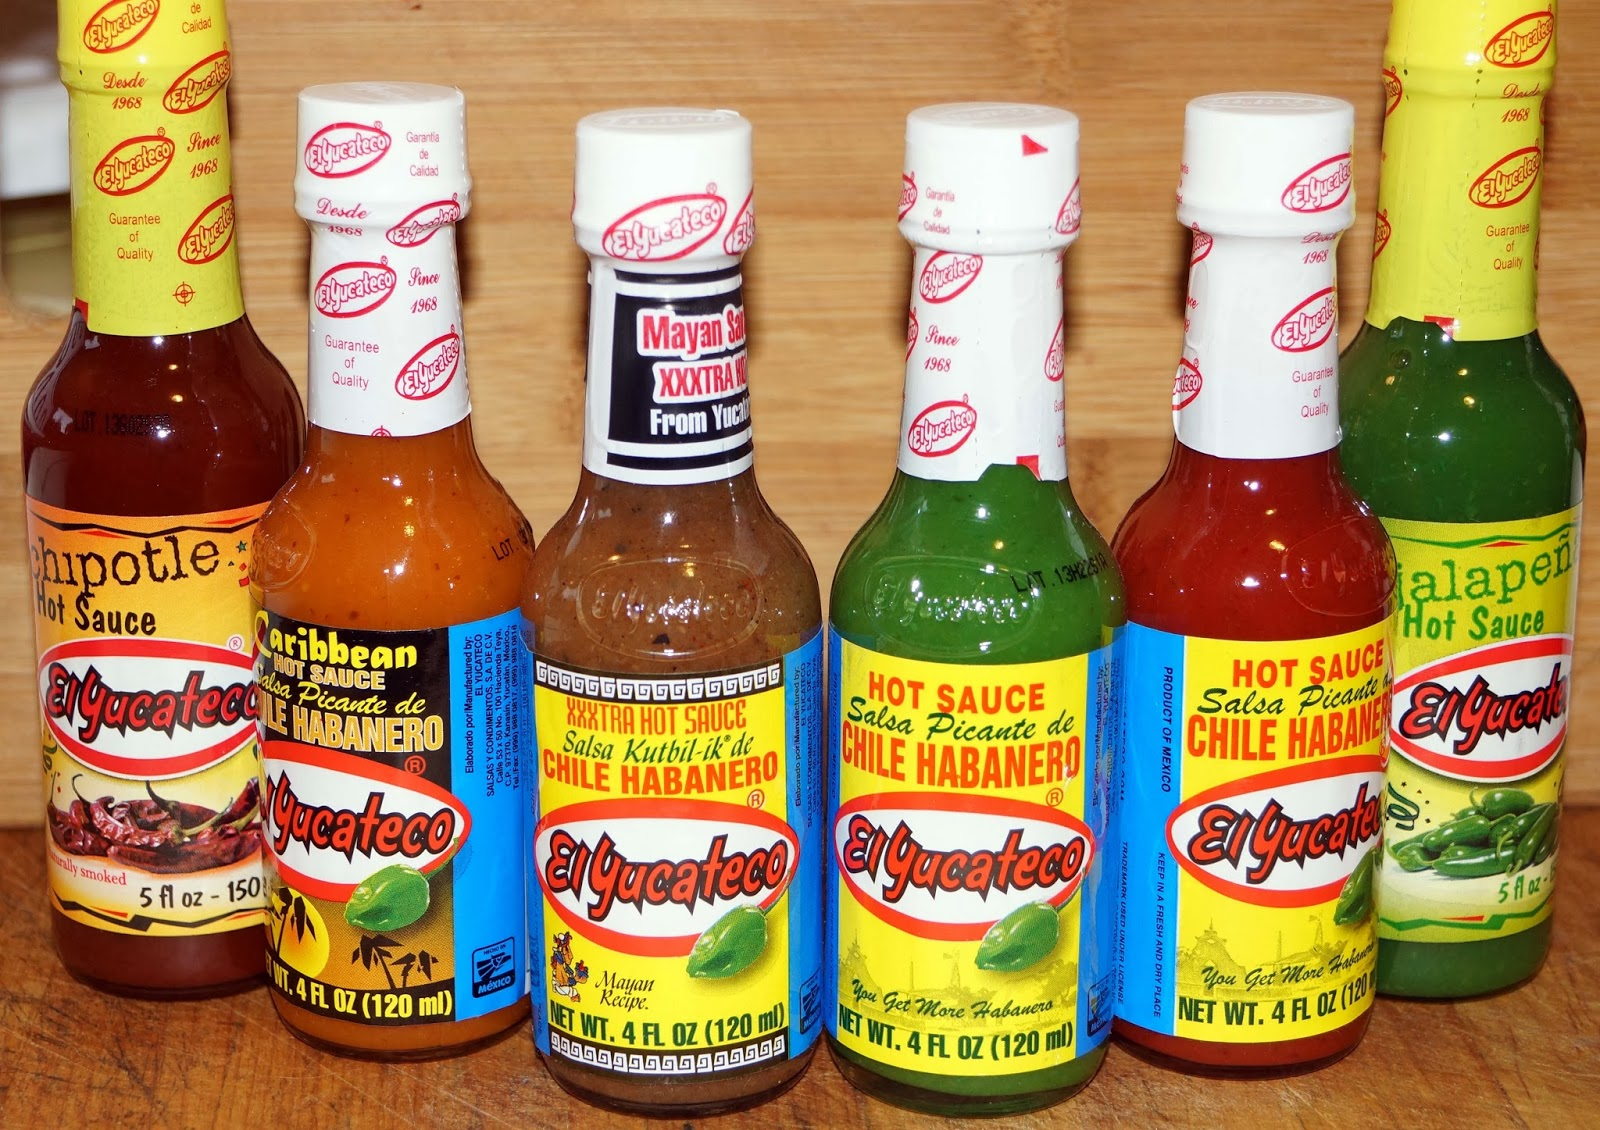 Favorite hot sauces? Sauces